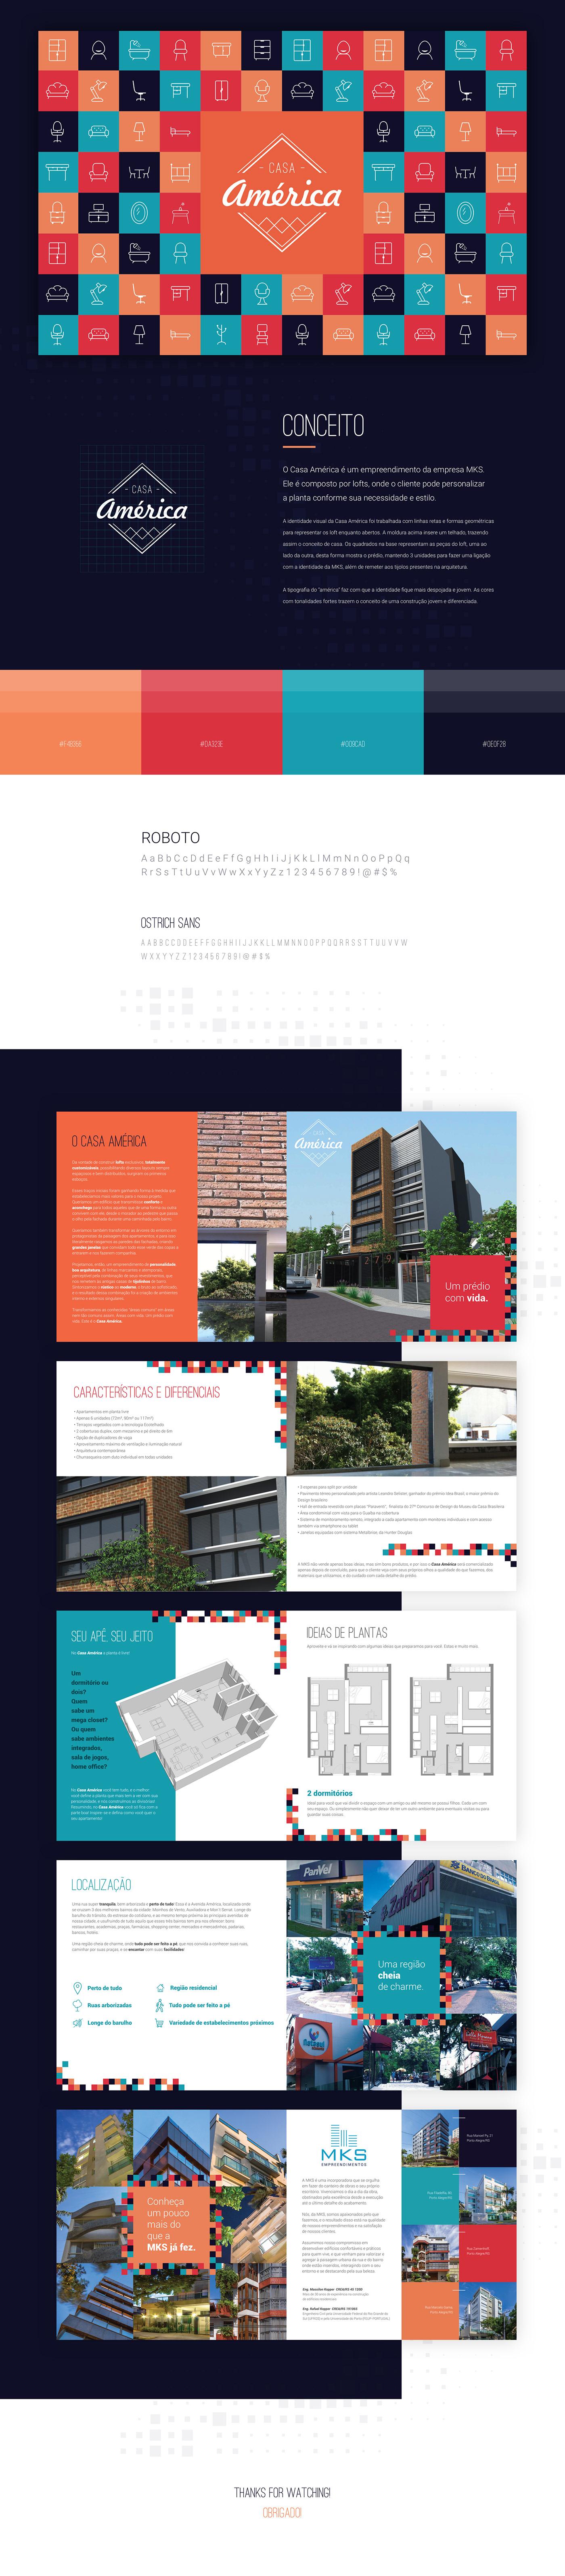 estilo despojado Londres ARQUITETURA LOFT Empreendimento building Style colors London brand